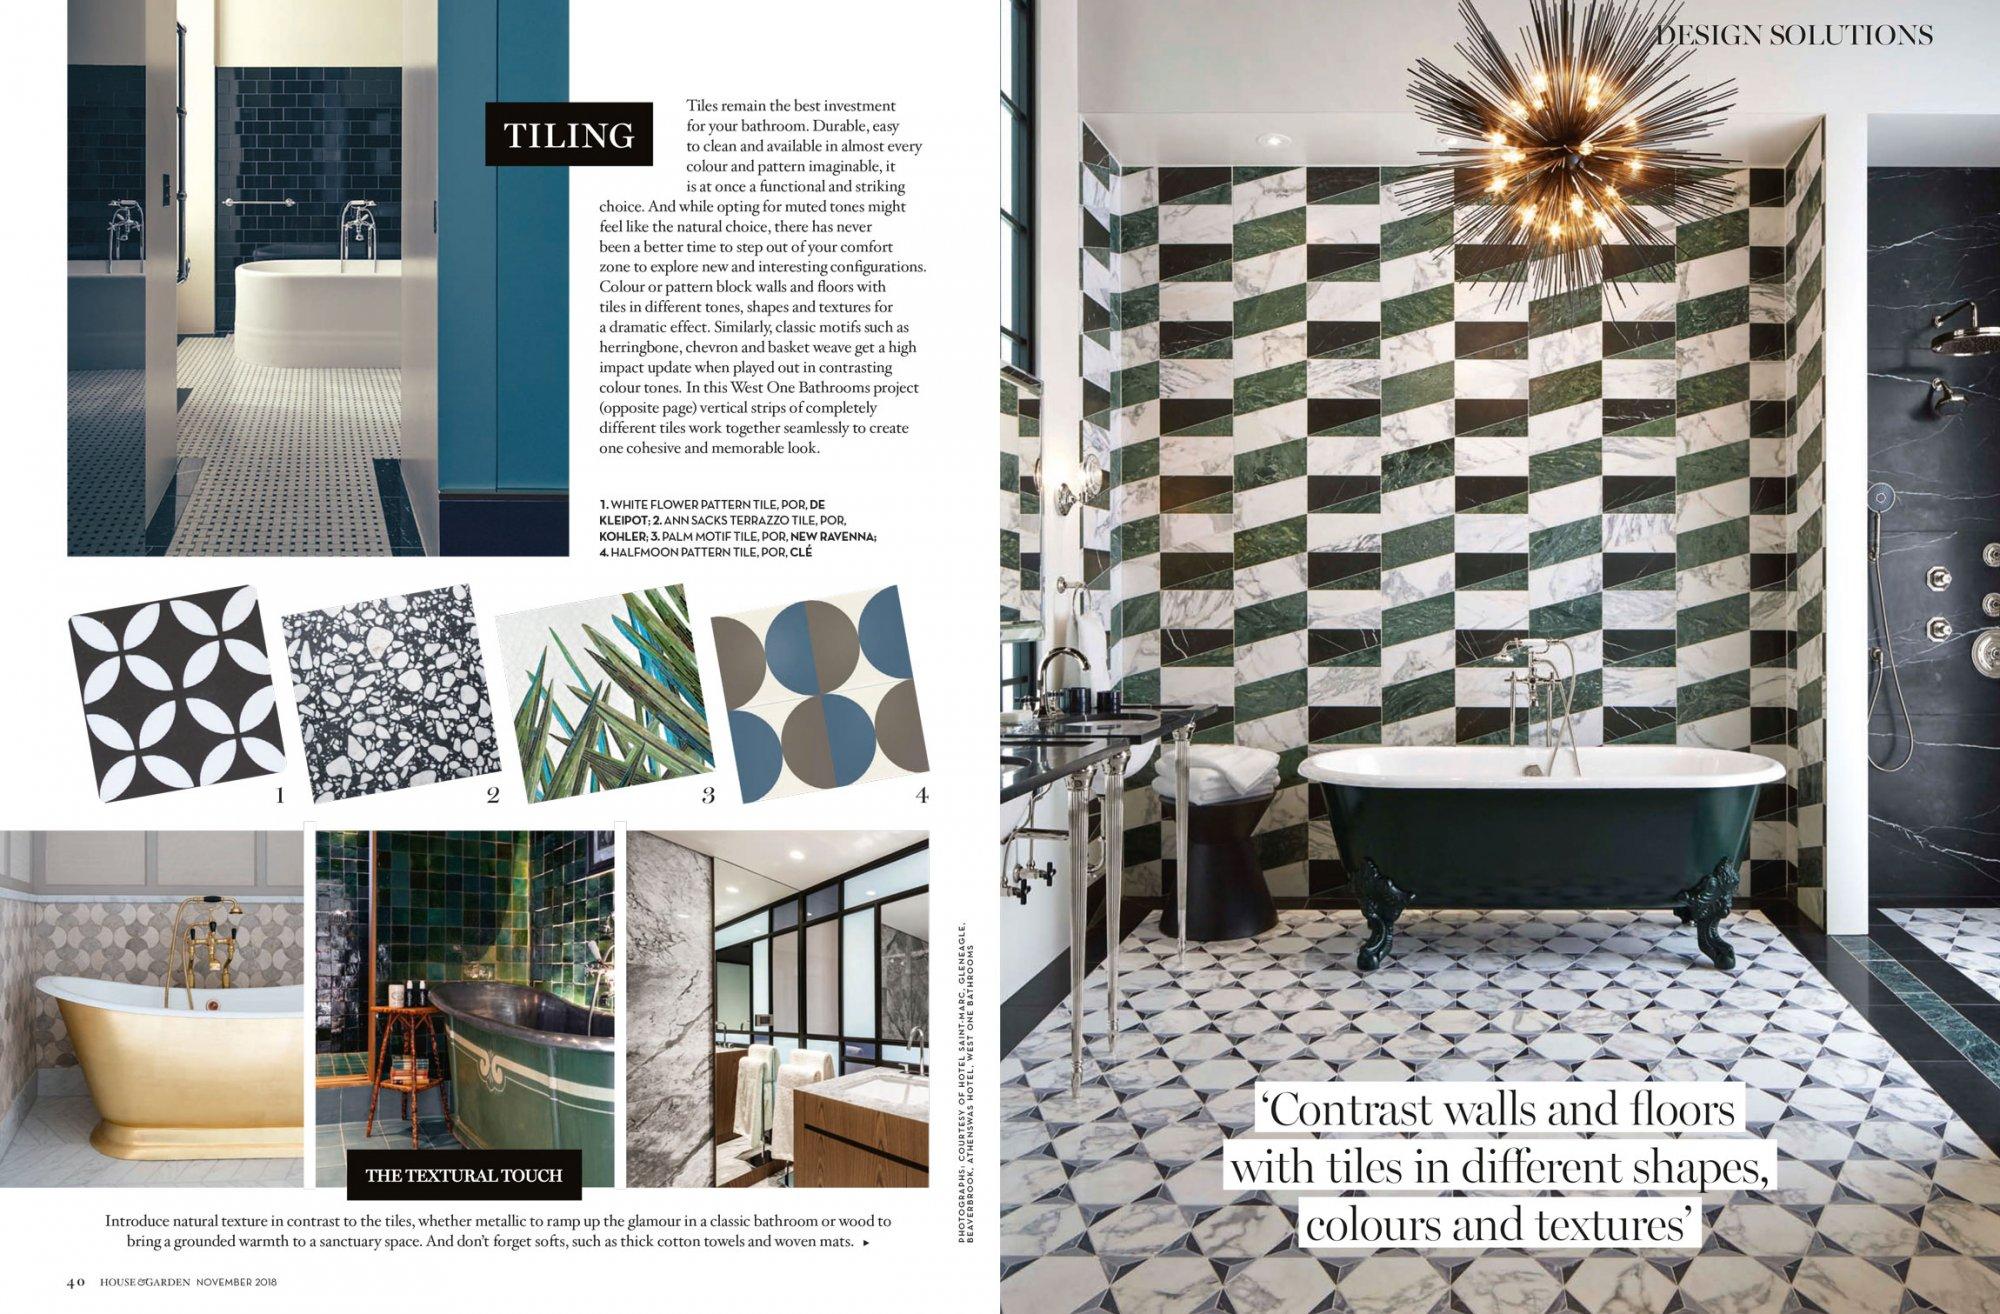 H&G Nov 18 DesignSolutions Bathrooms 2